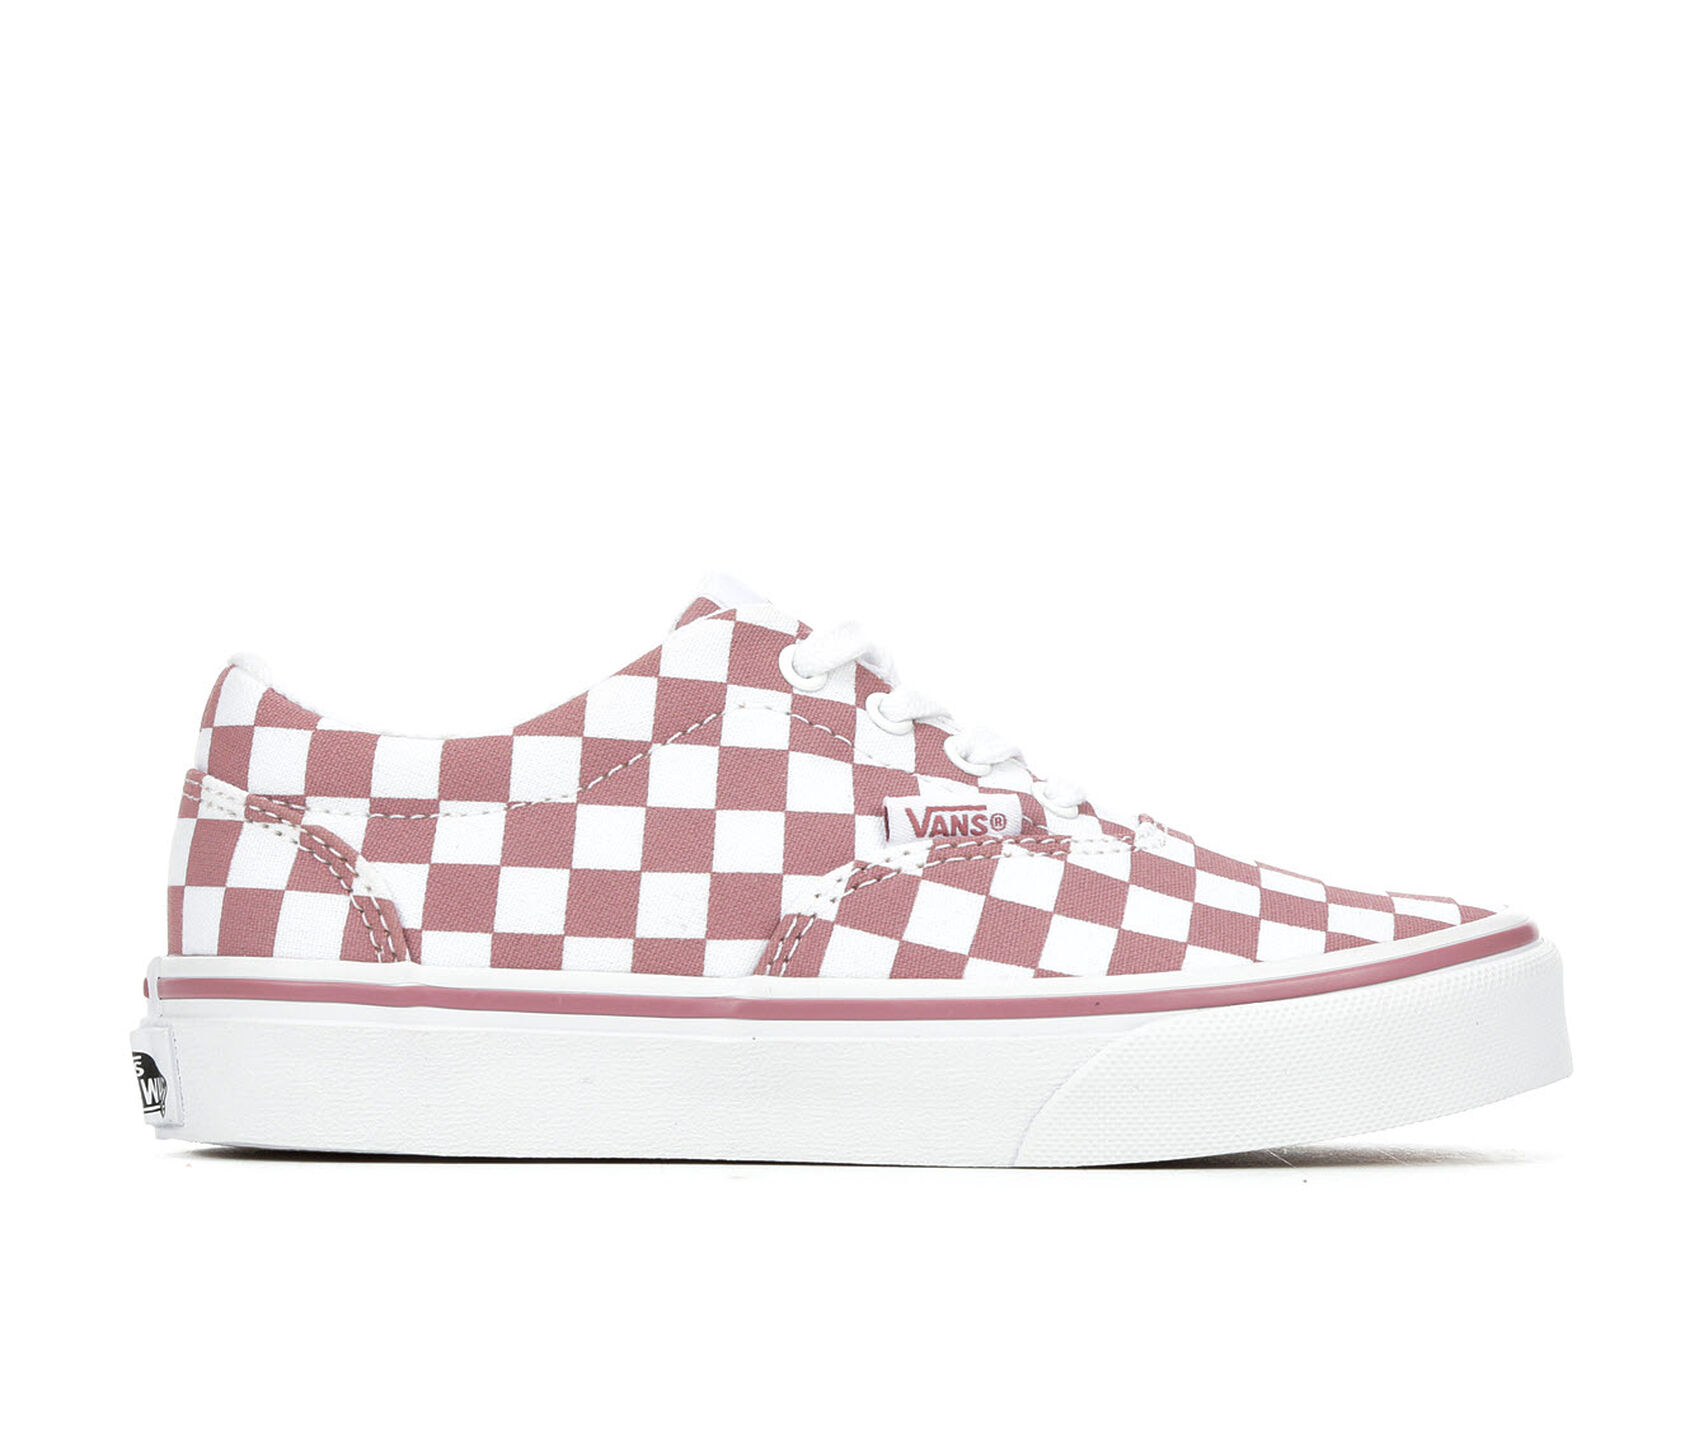 92b76fd9e3ea1 Girls' Vans Little Kid & Big Kid Doheny Skate Shoes | Shoe Carnival